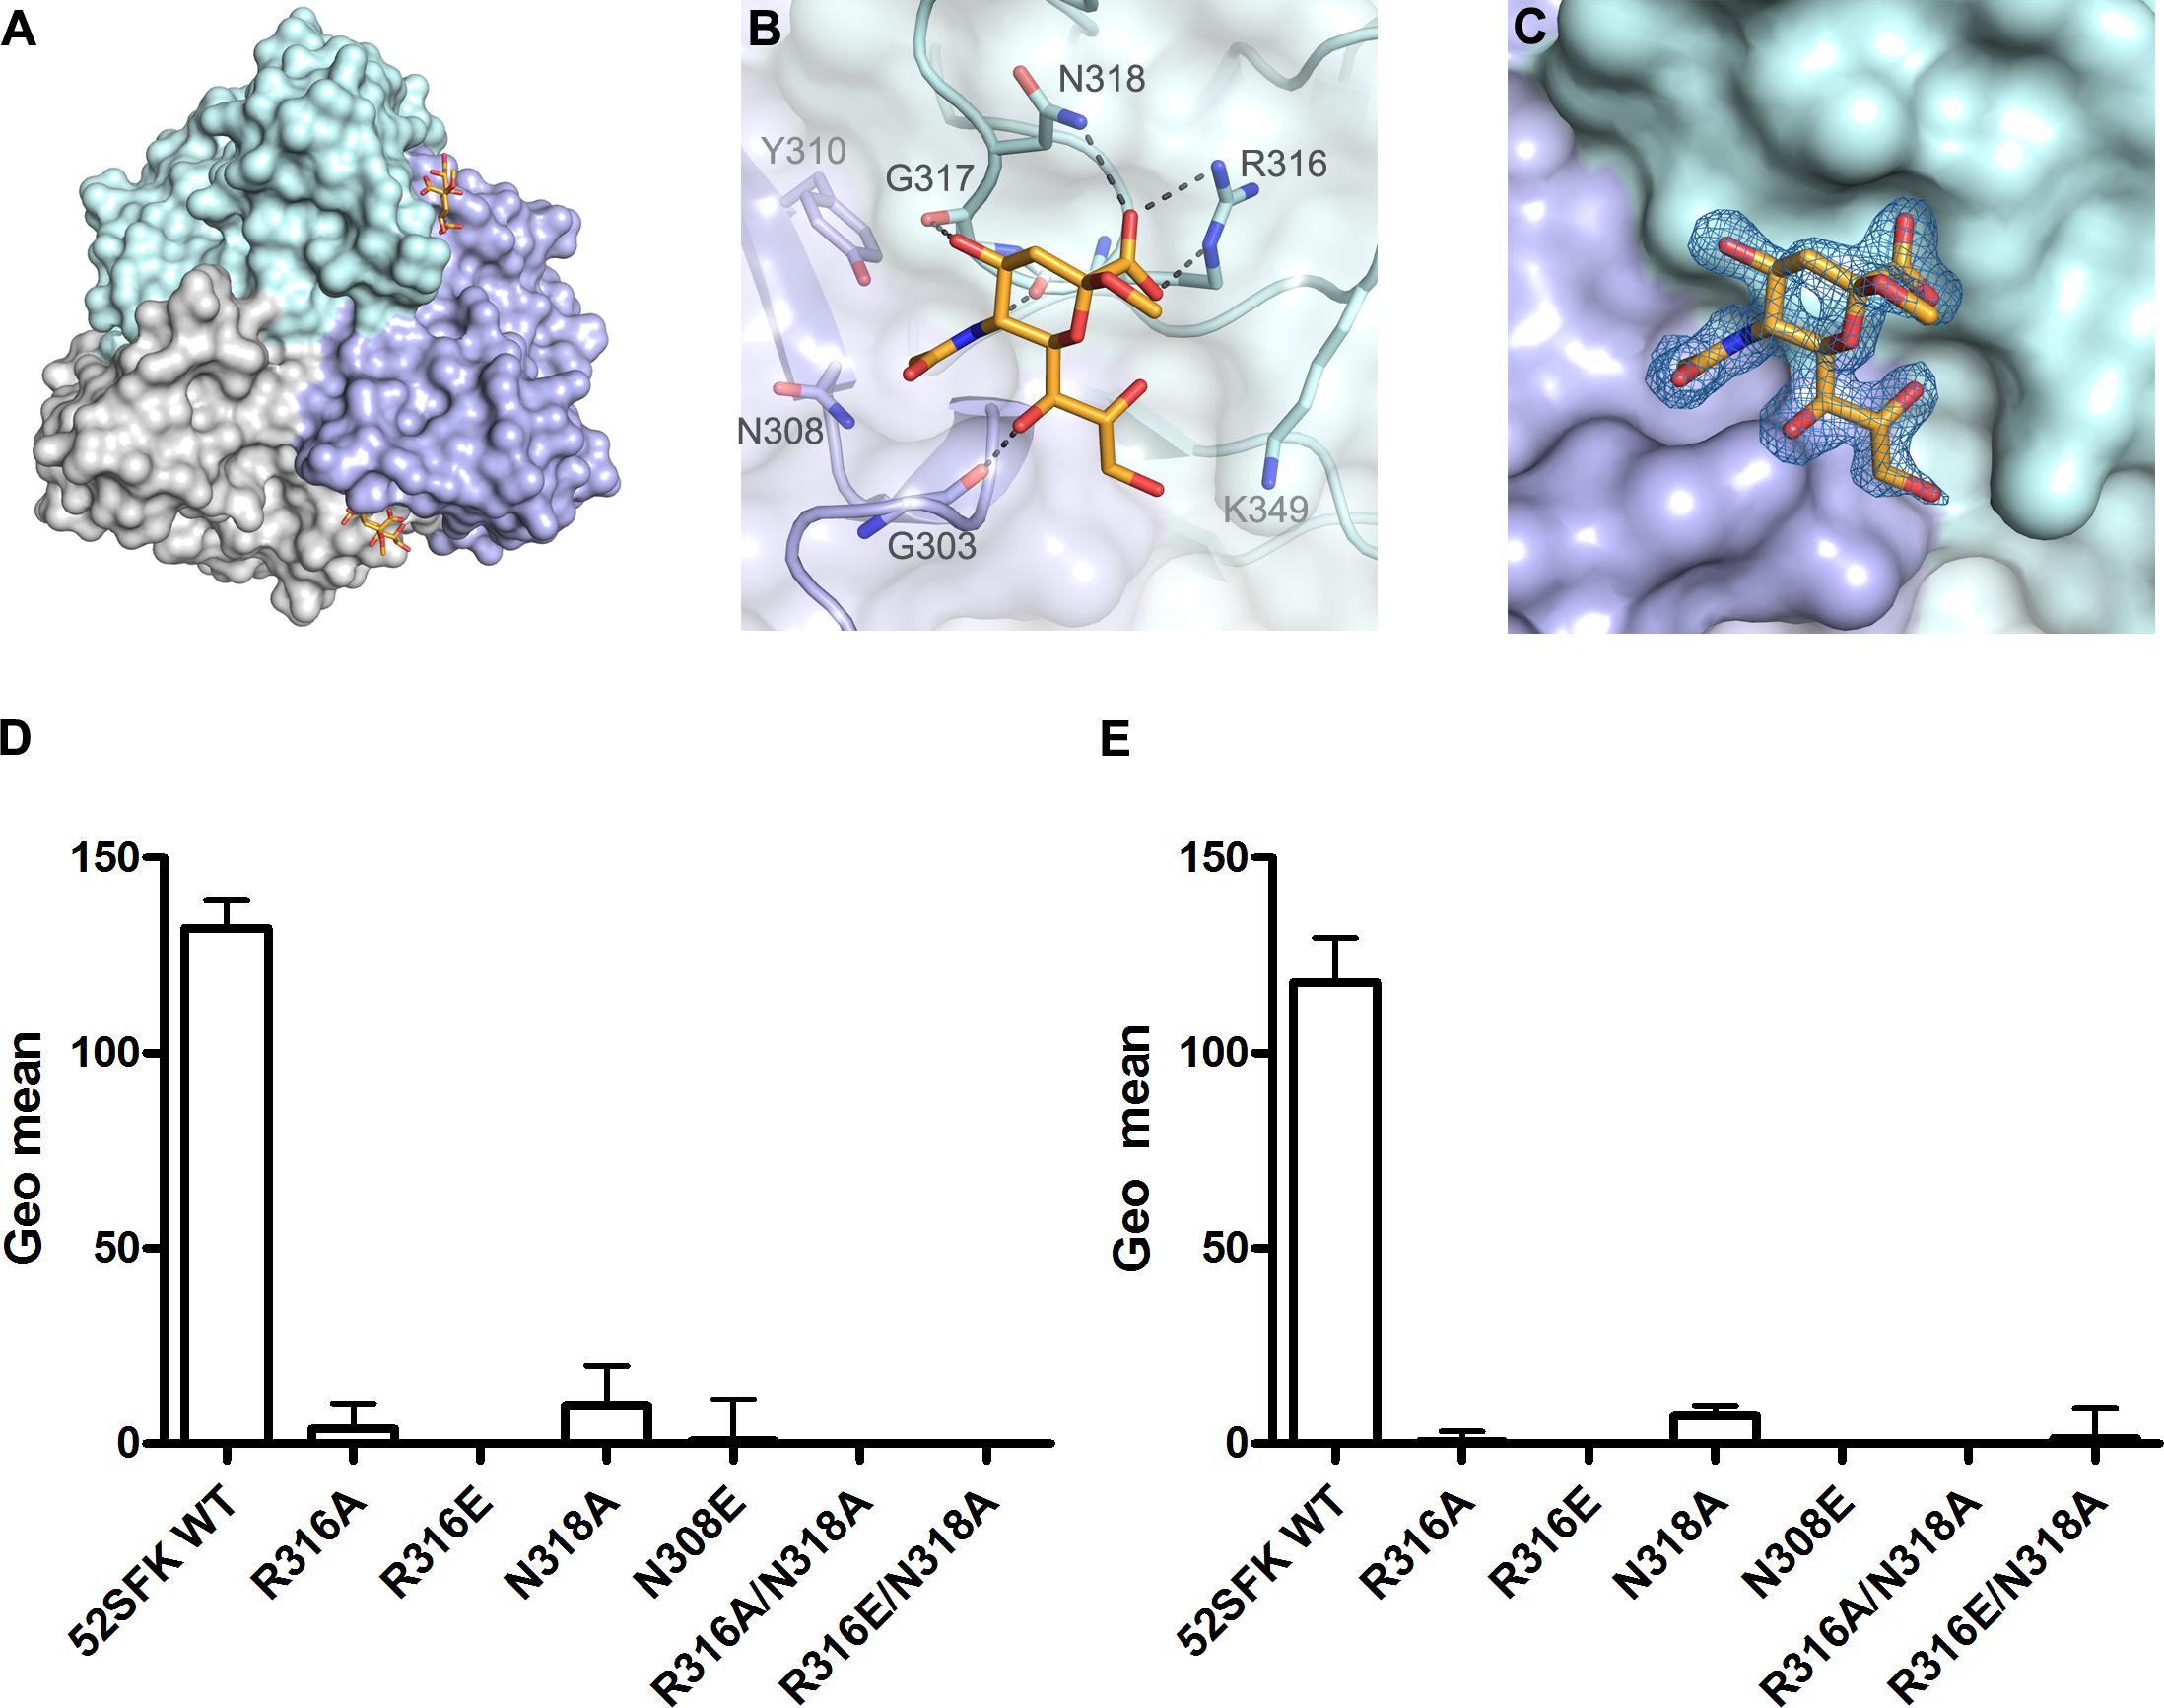 HAdV-52 interaction with sialic acid.